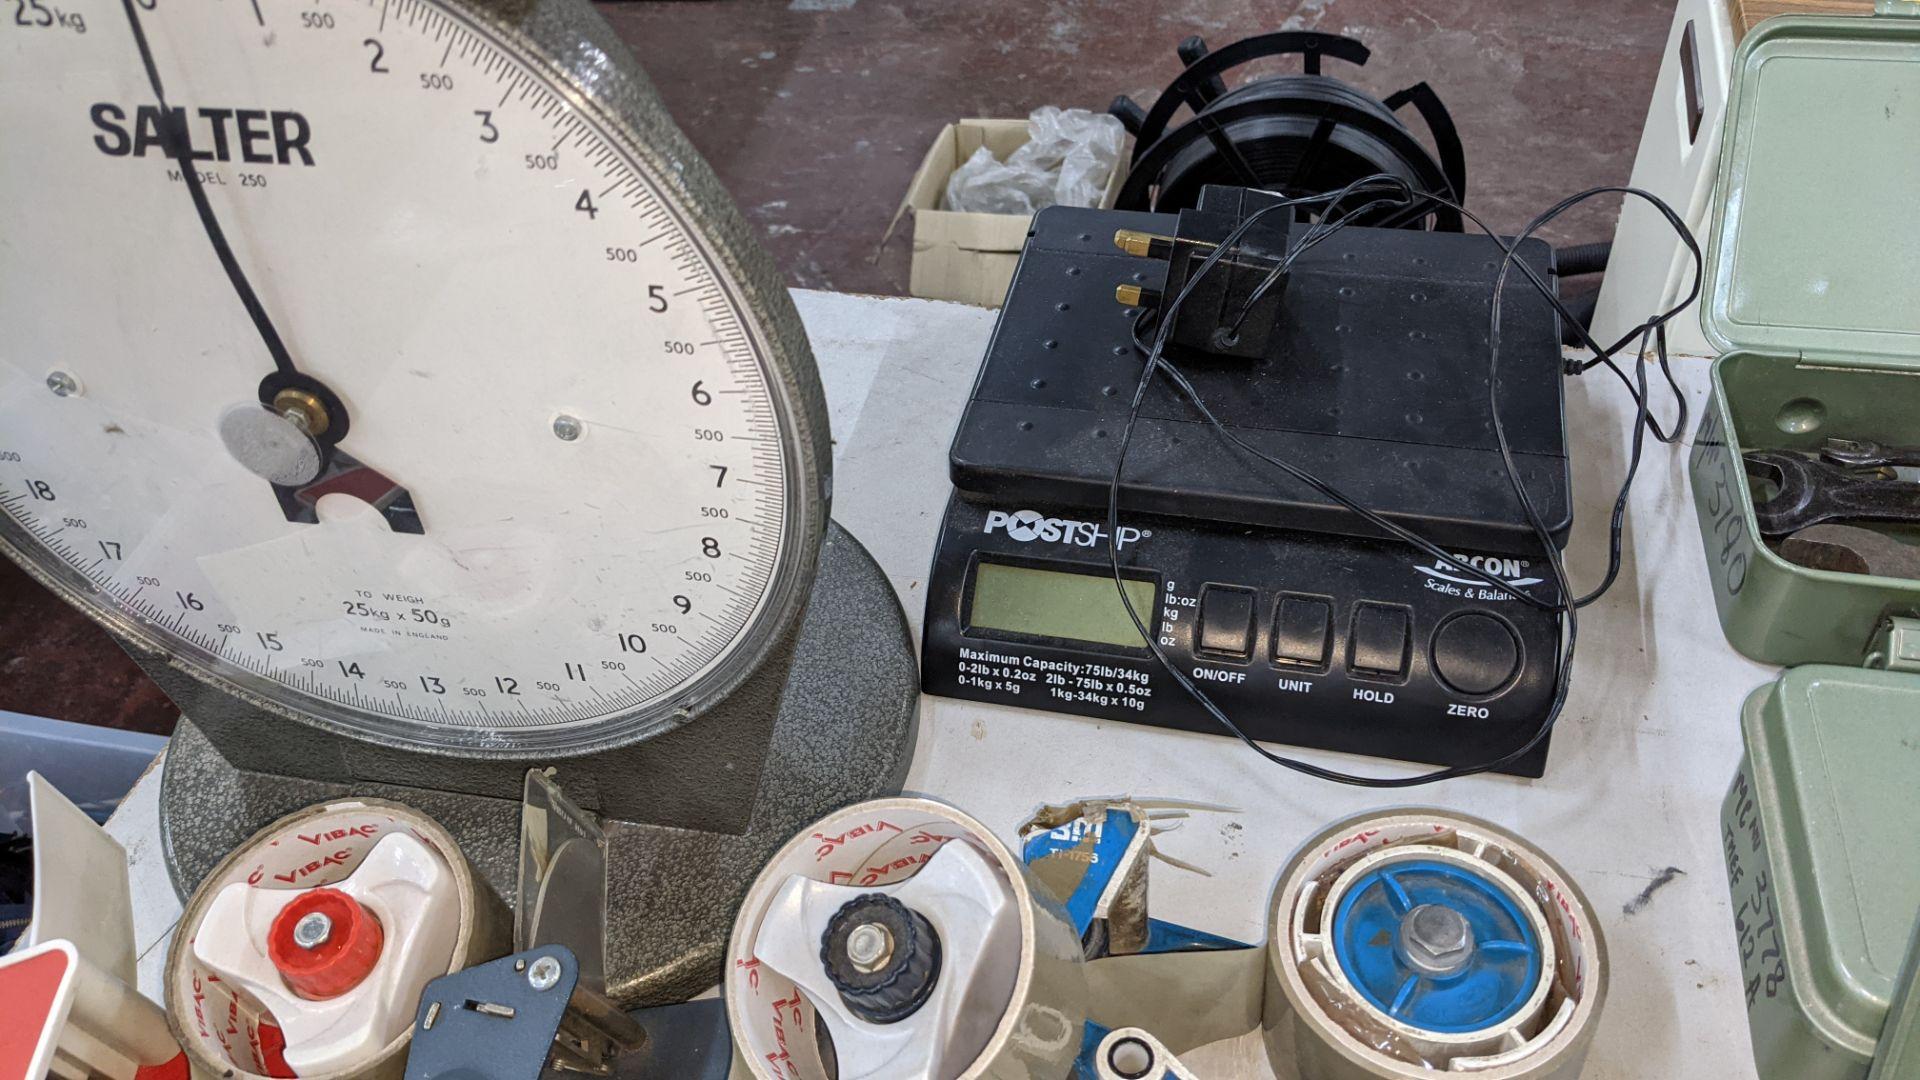 Mixed lot comprising 3 tape guns, 1 digital scales & 1 Salter platform scales - Image 5 of 5